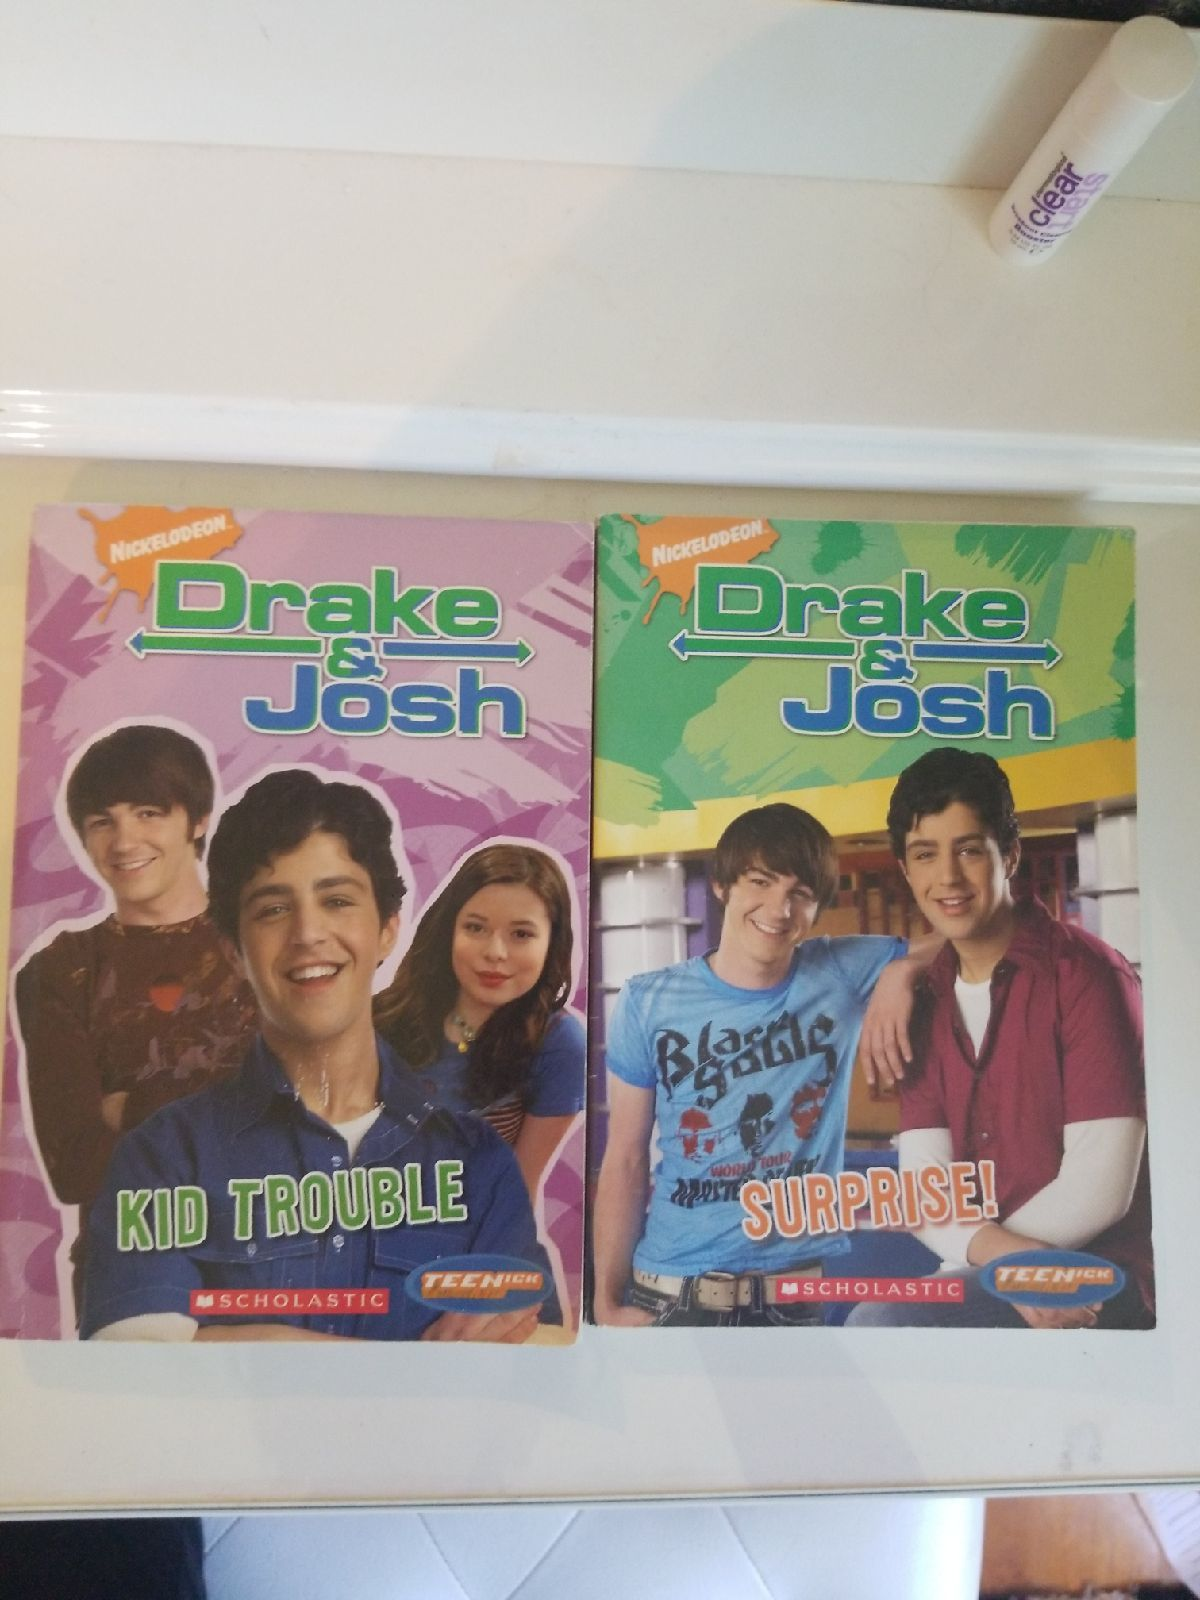 2 books from the hit series drake josh drake and josh